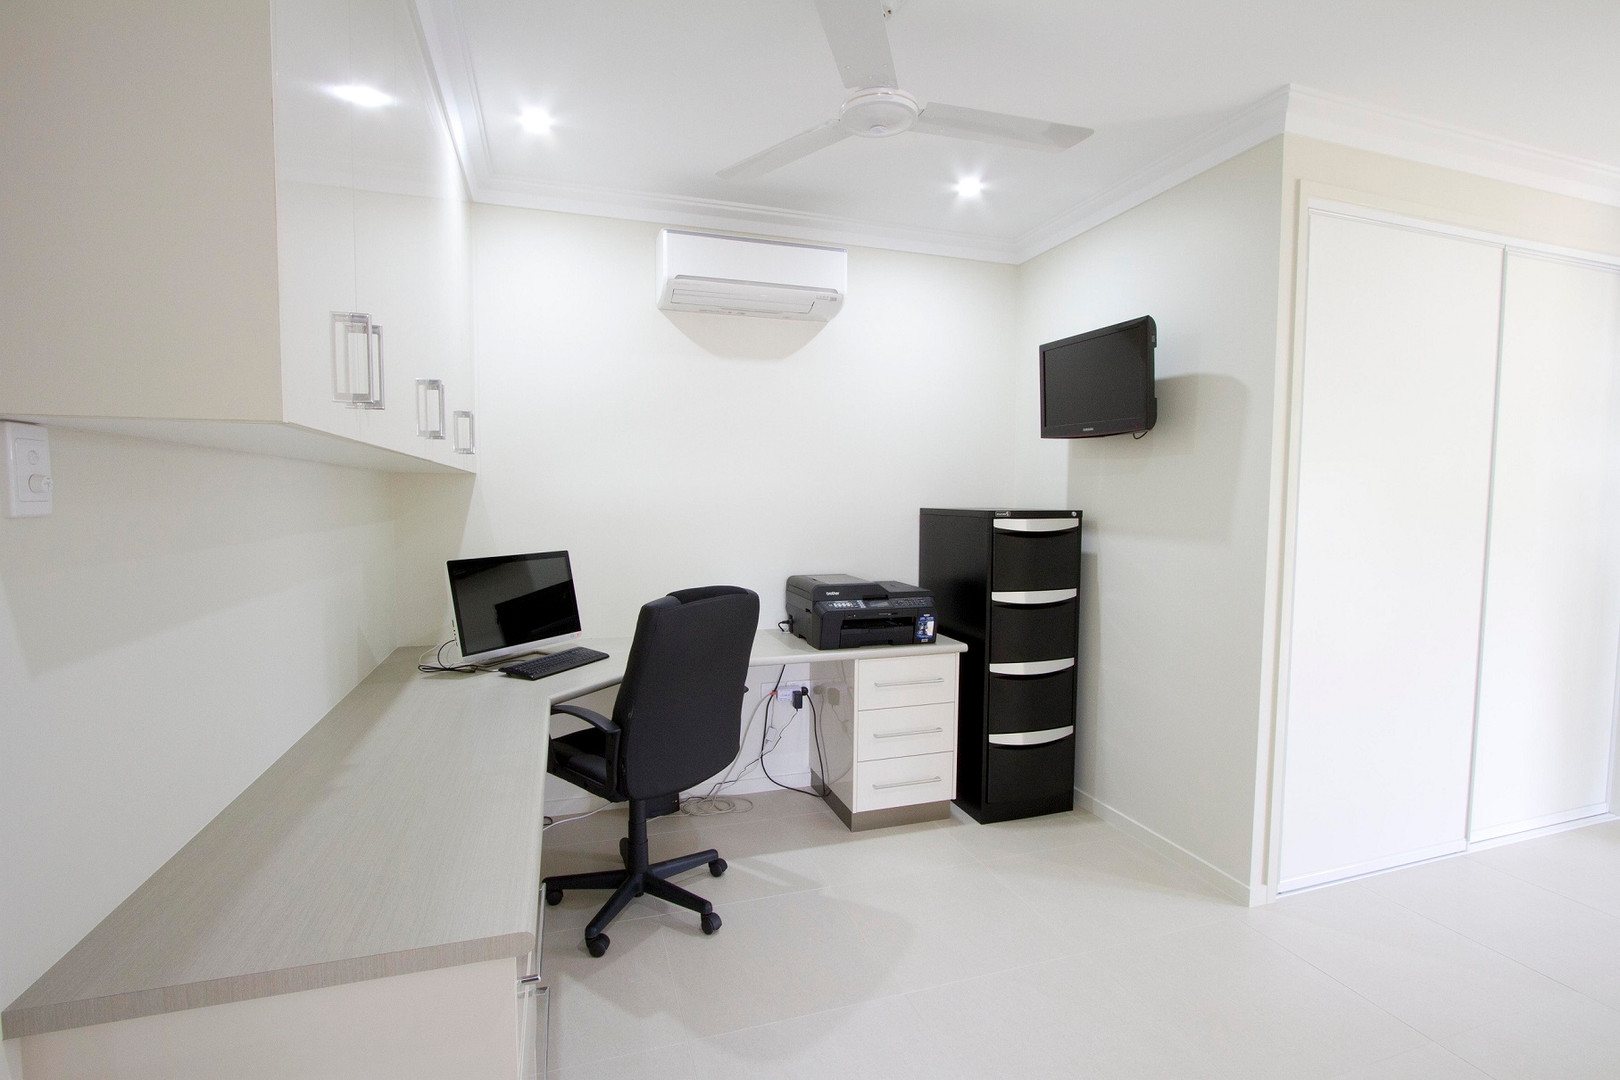 29 - C2 - Office 2.jpg